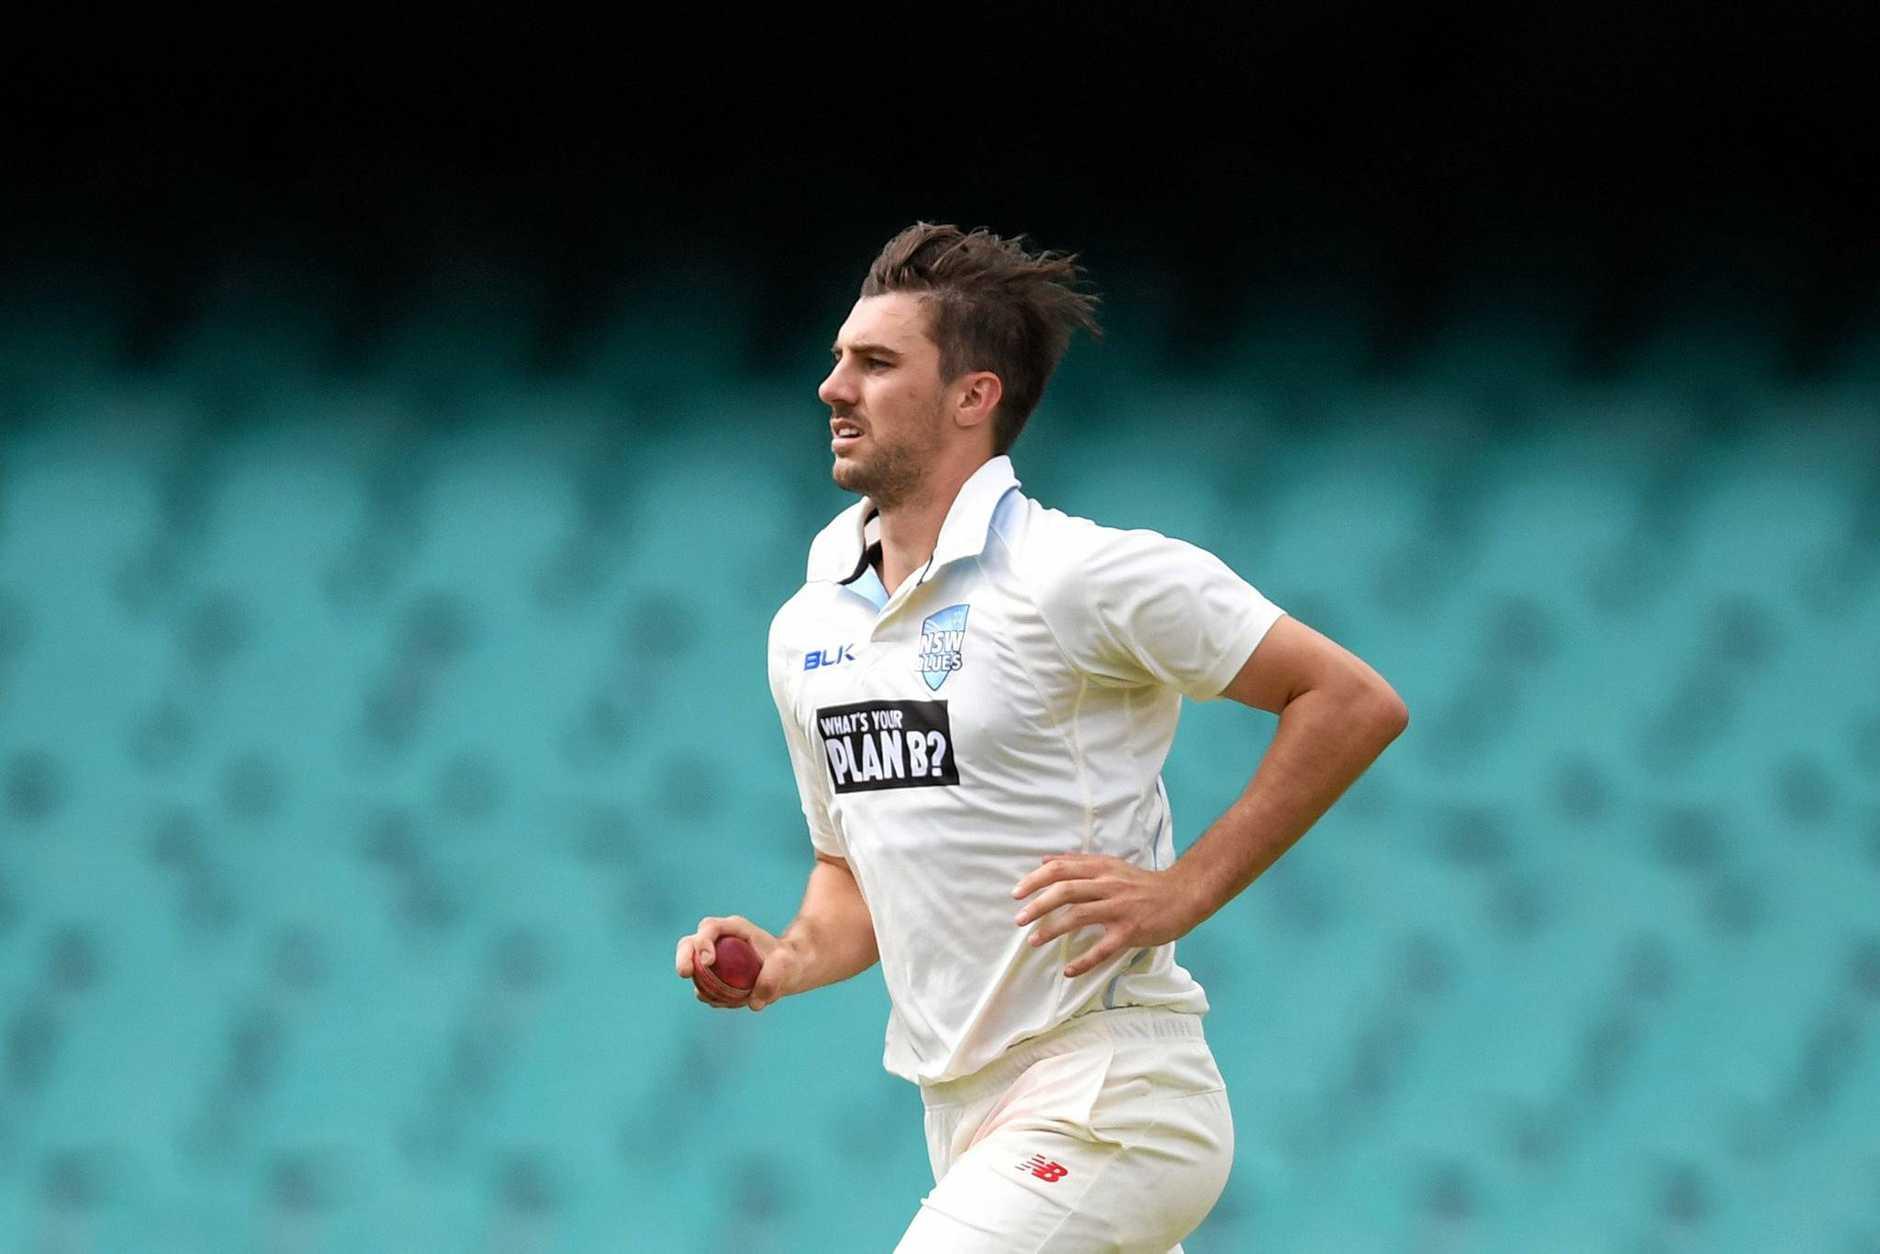 NSW bowler Pat Cummins bowls at the Sydney Cricket Ground last Wednesday